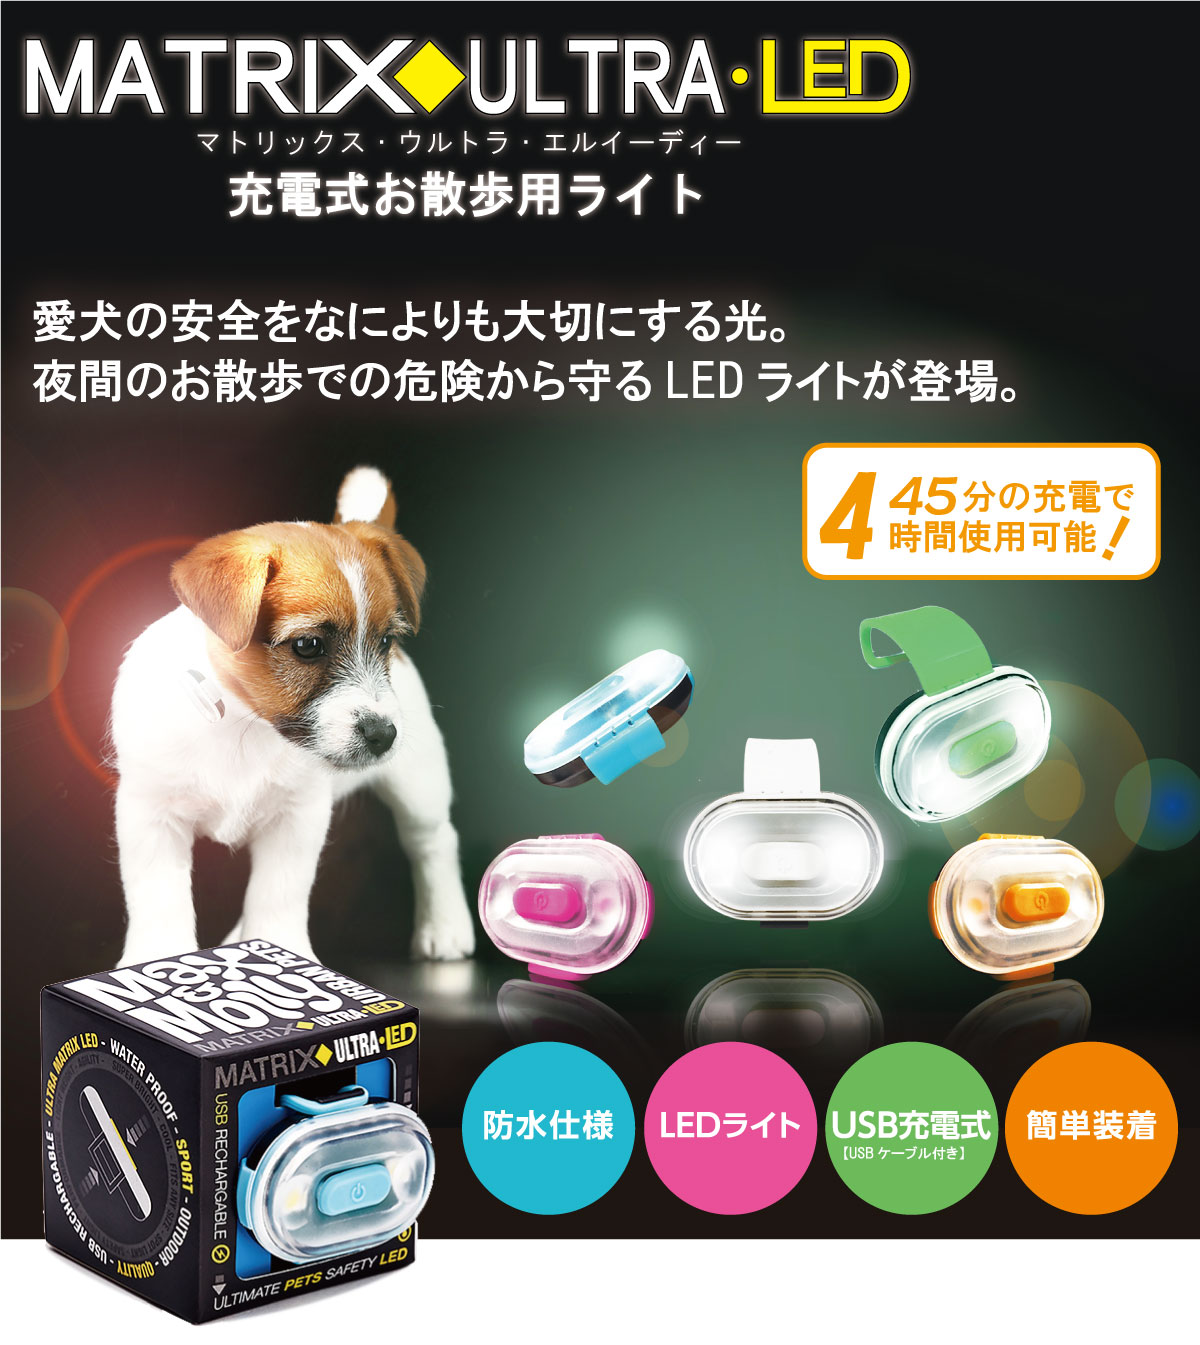 MAX & MOLLY MATRIX ULTRA LED 充電式 お散歩 ライト